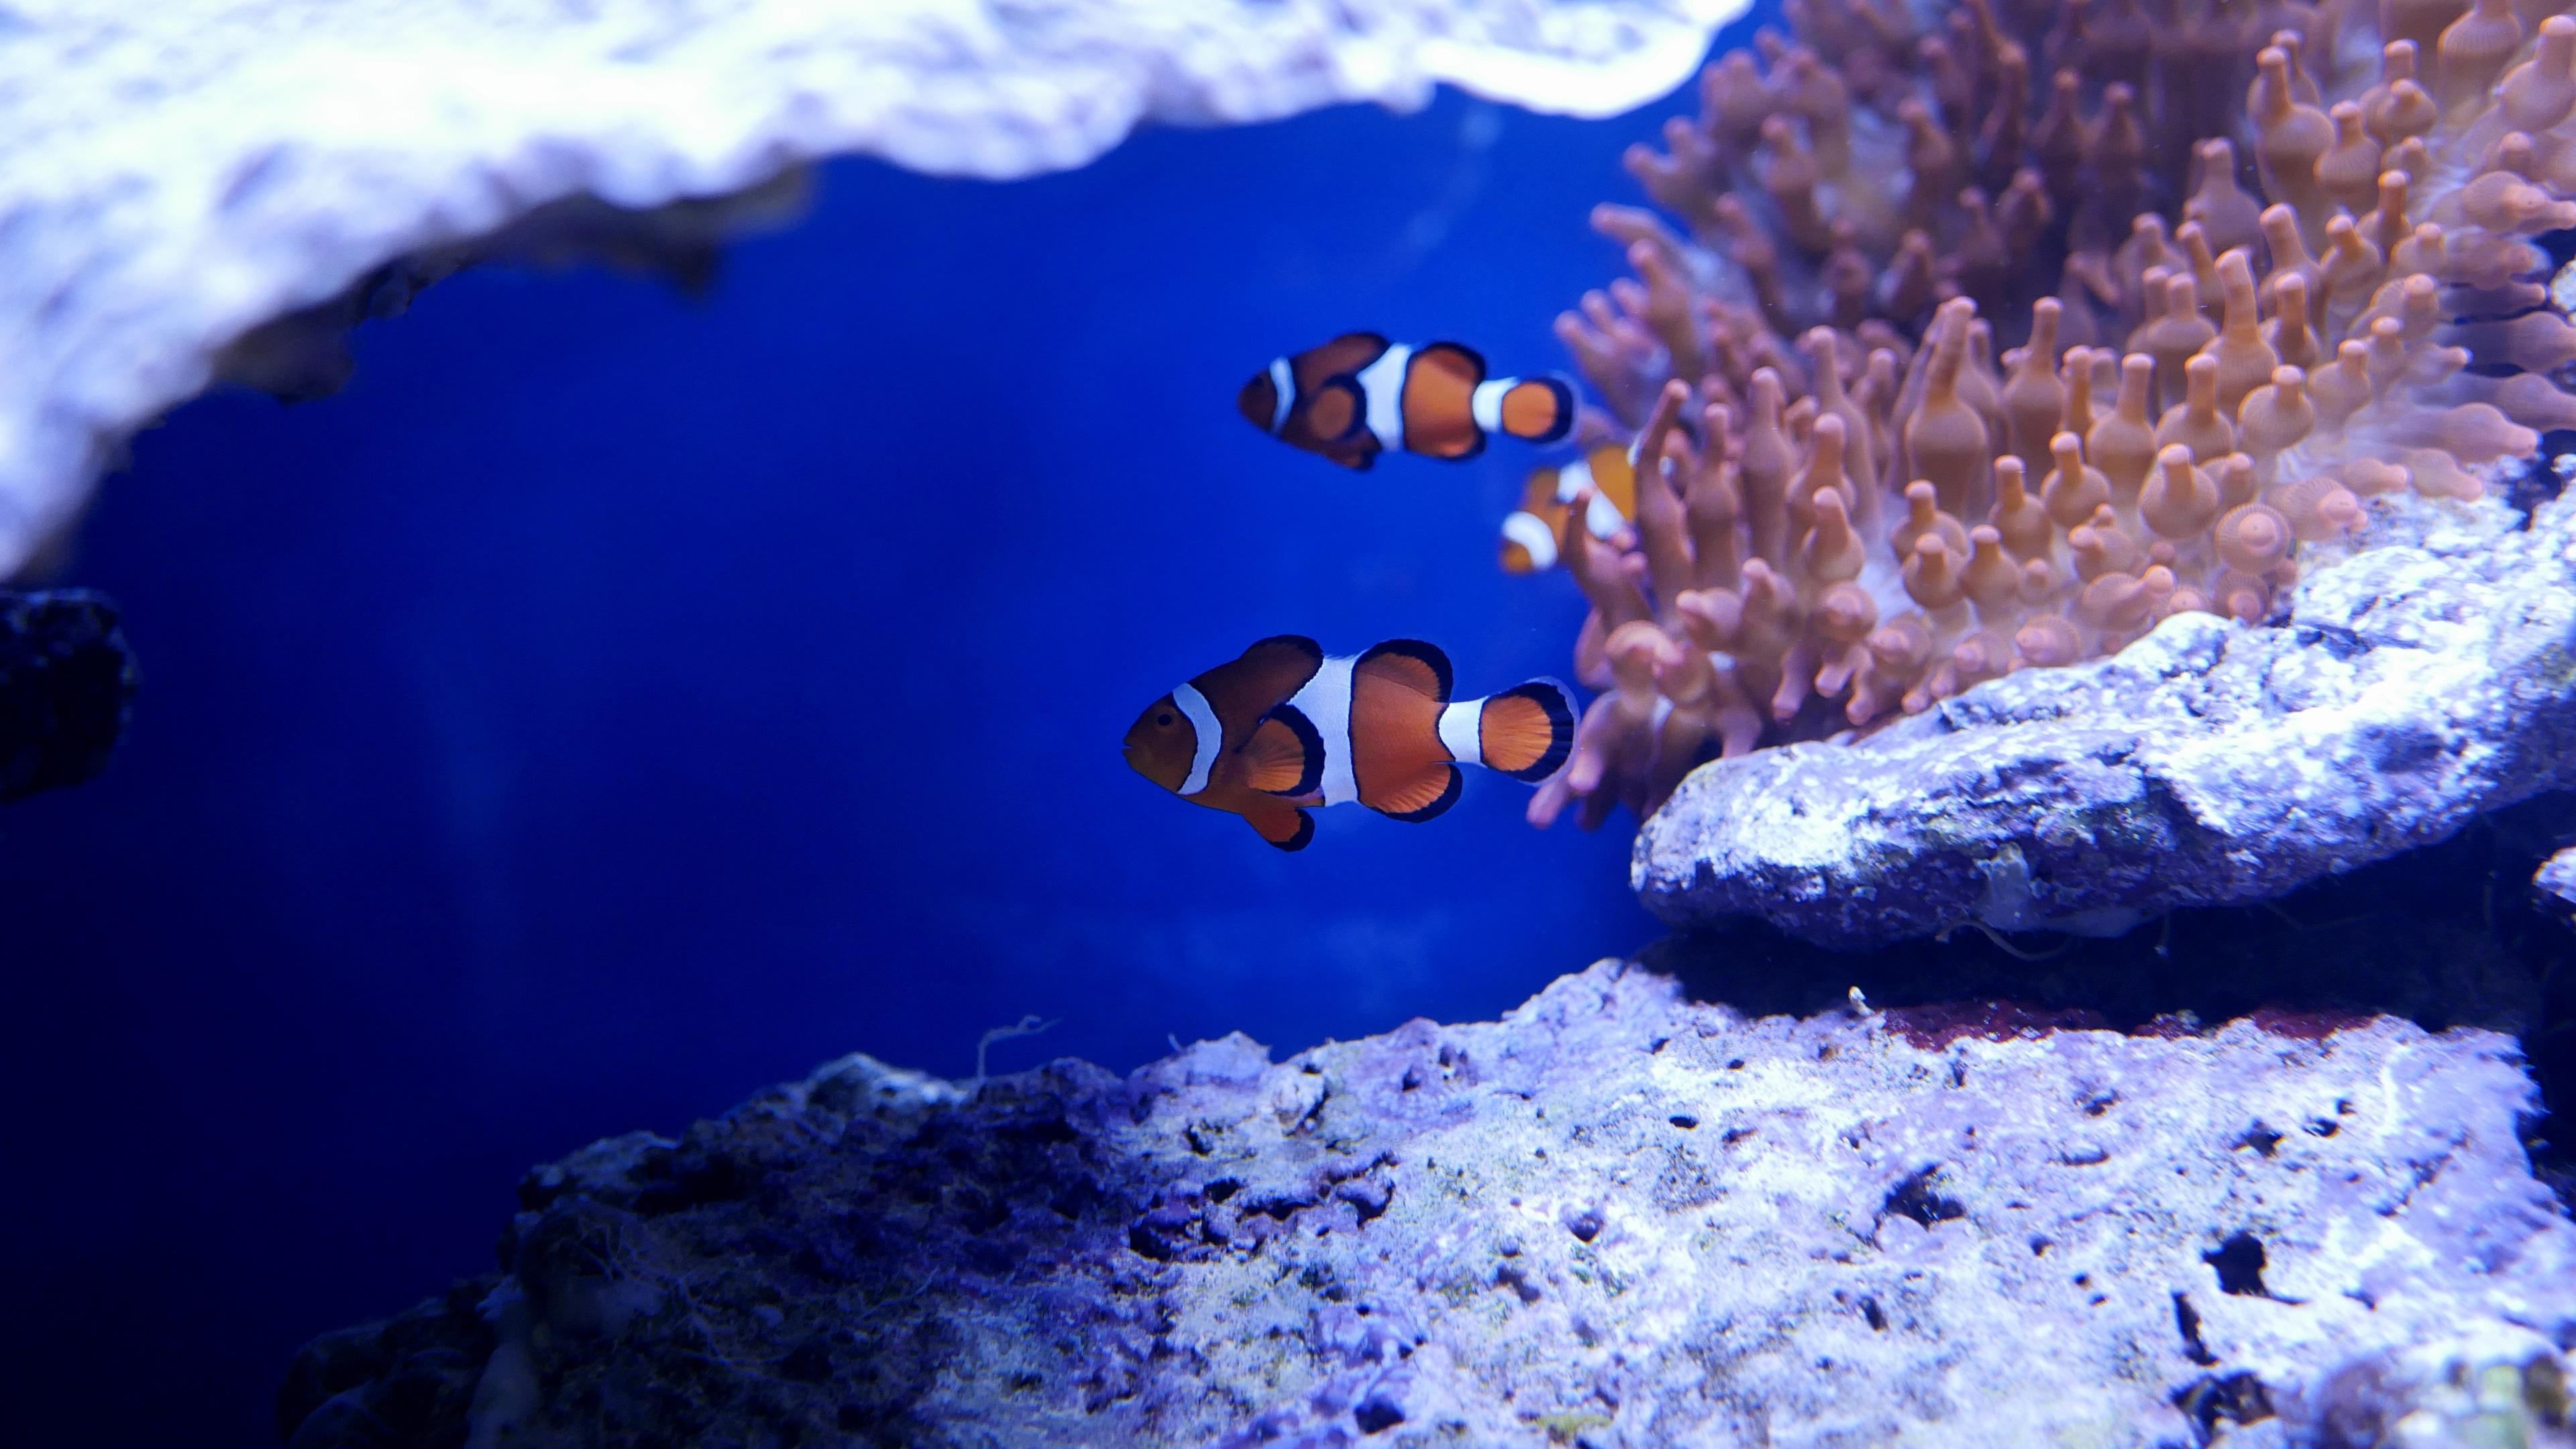 nemo fish in real underwater 4k 1542238761 - Nemo Fish In Real Underwater 4k - underwater wallpapers, sea wallpapers, ocean wallpapers, nemo wallpapers, hd-wallpapers, fish wallpapers, animals wallpapers, 4k-wallpapers